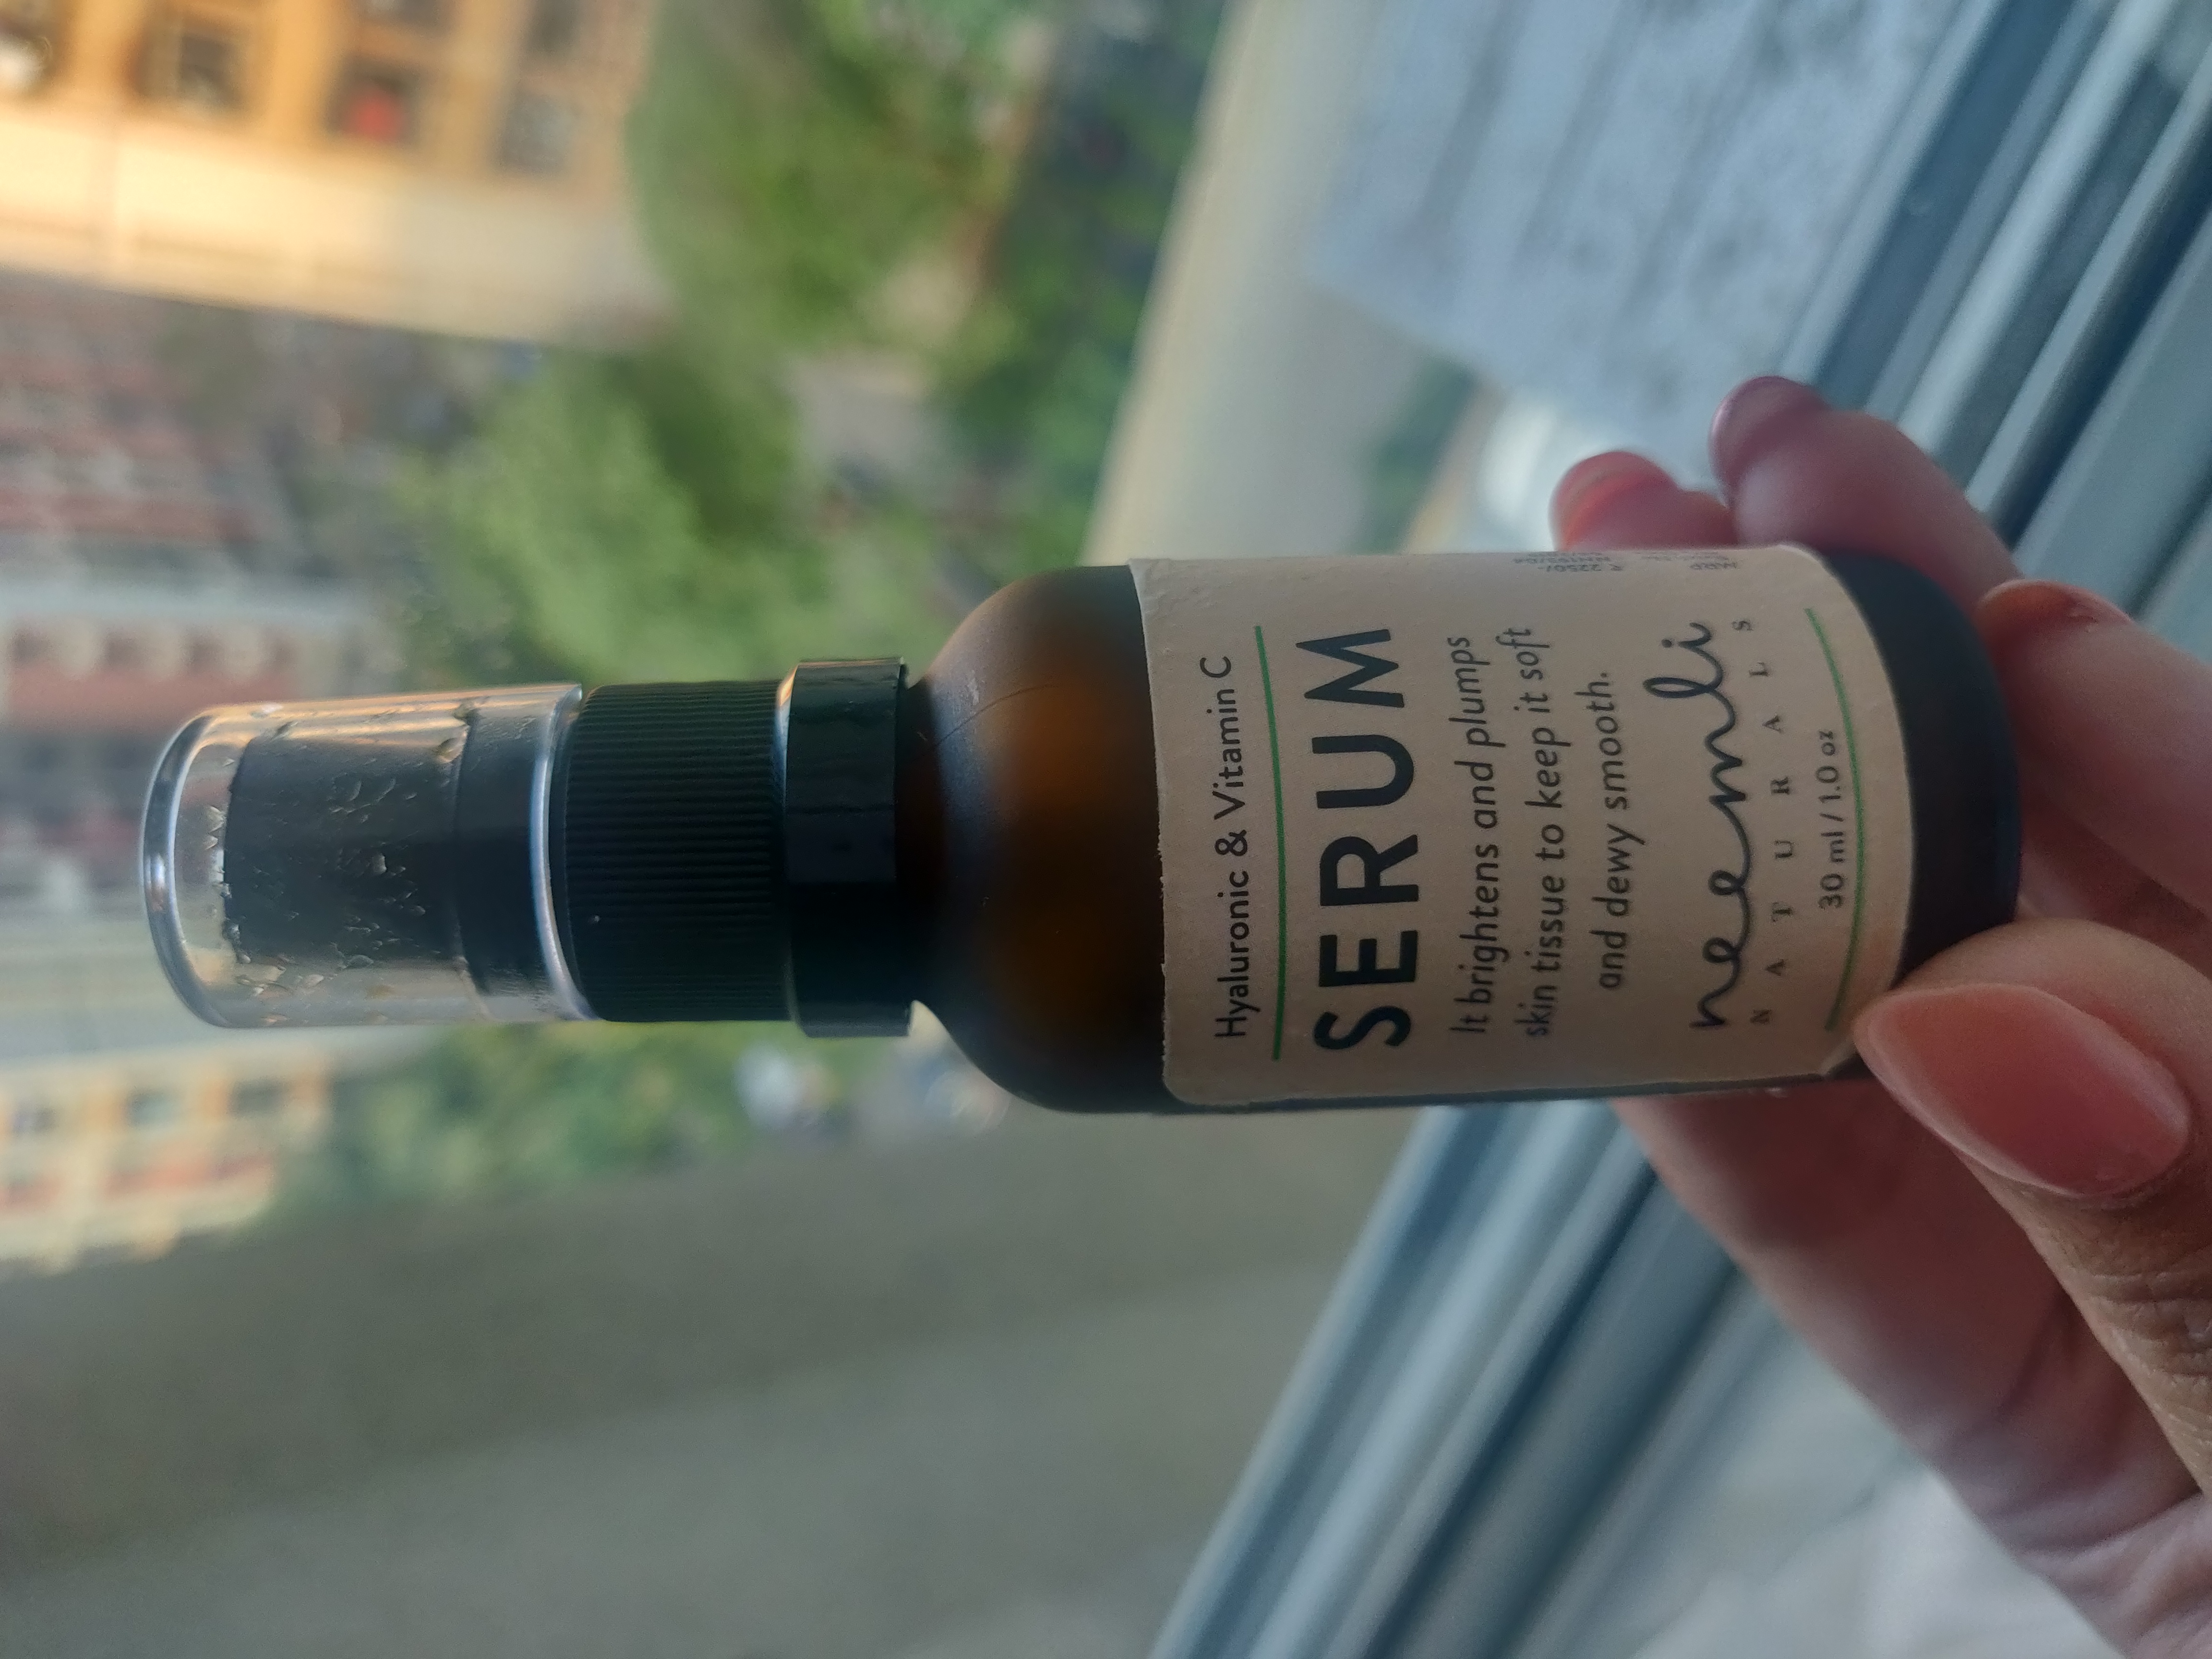 Neemli Naturals Hyaluronic & Vitamin C Serum -Dewy smooth plump skin with This serum-By apekshap